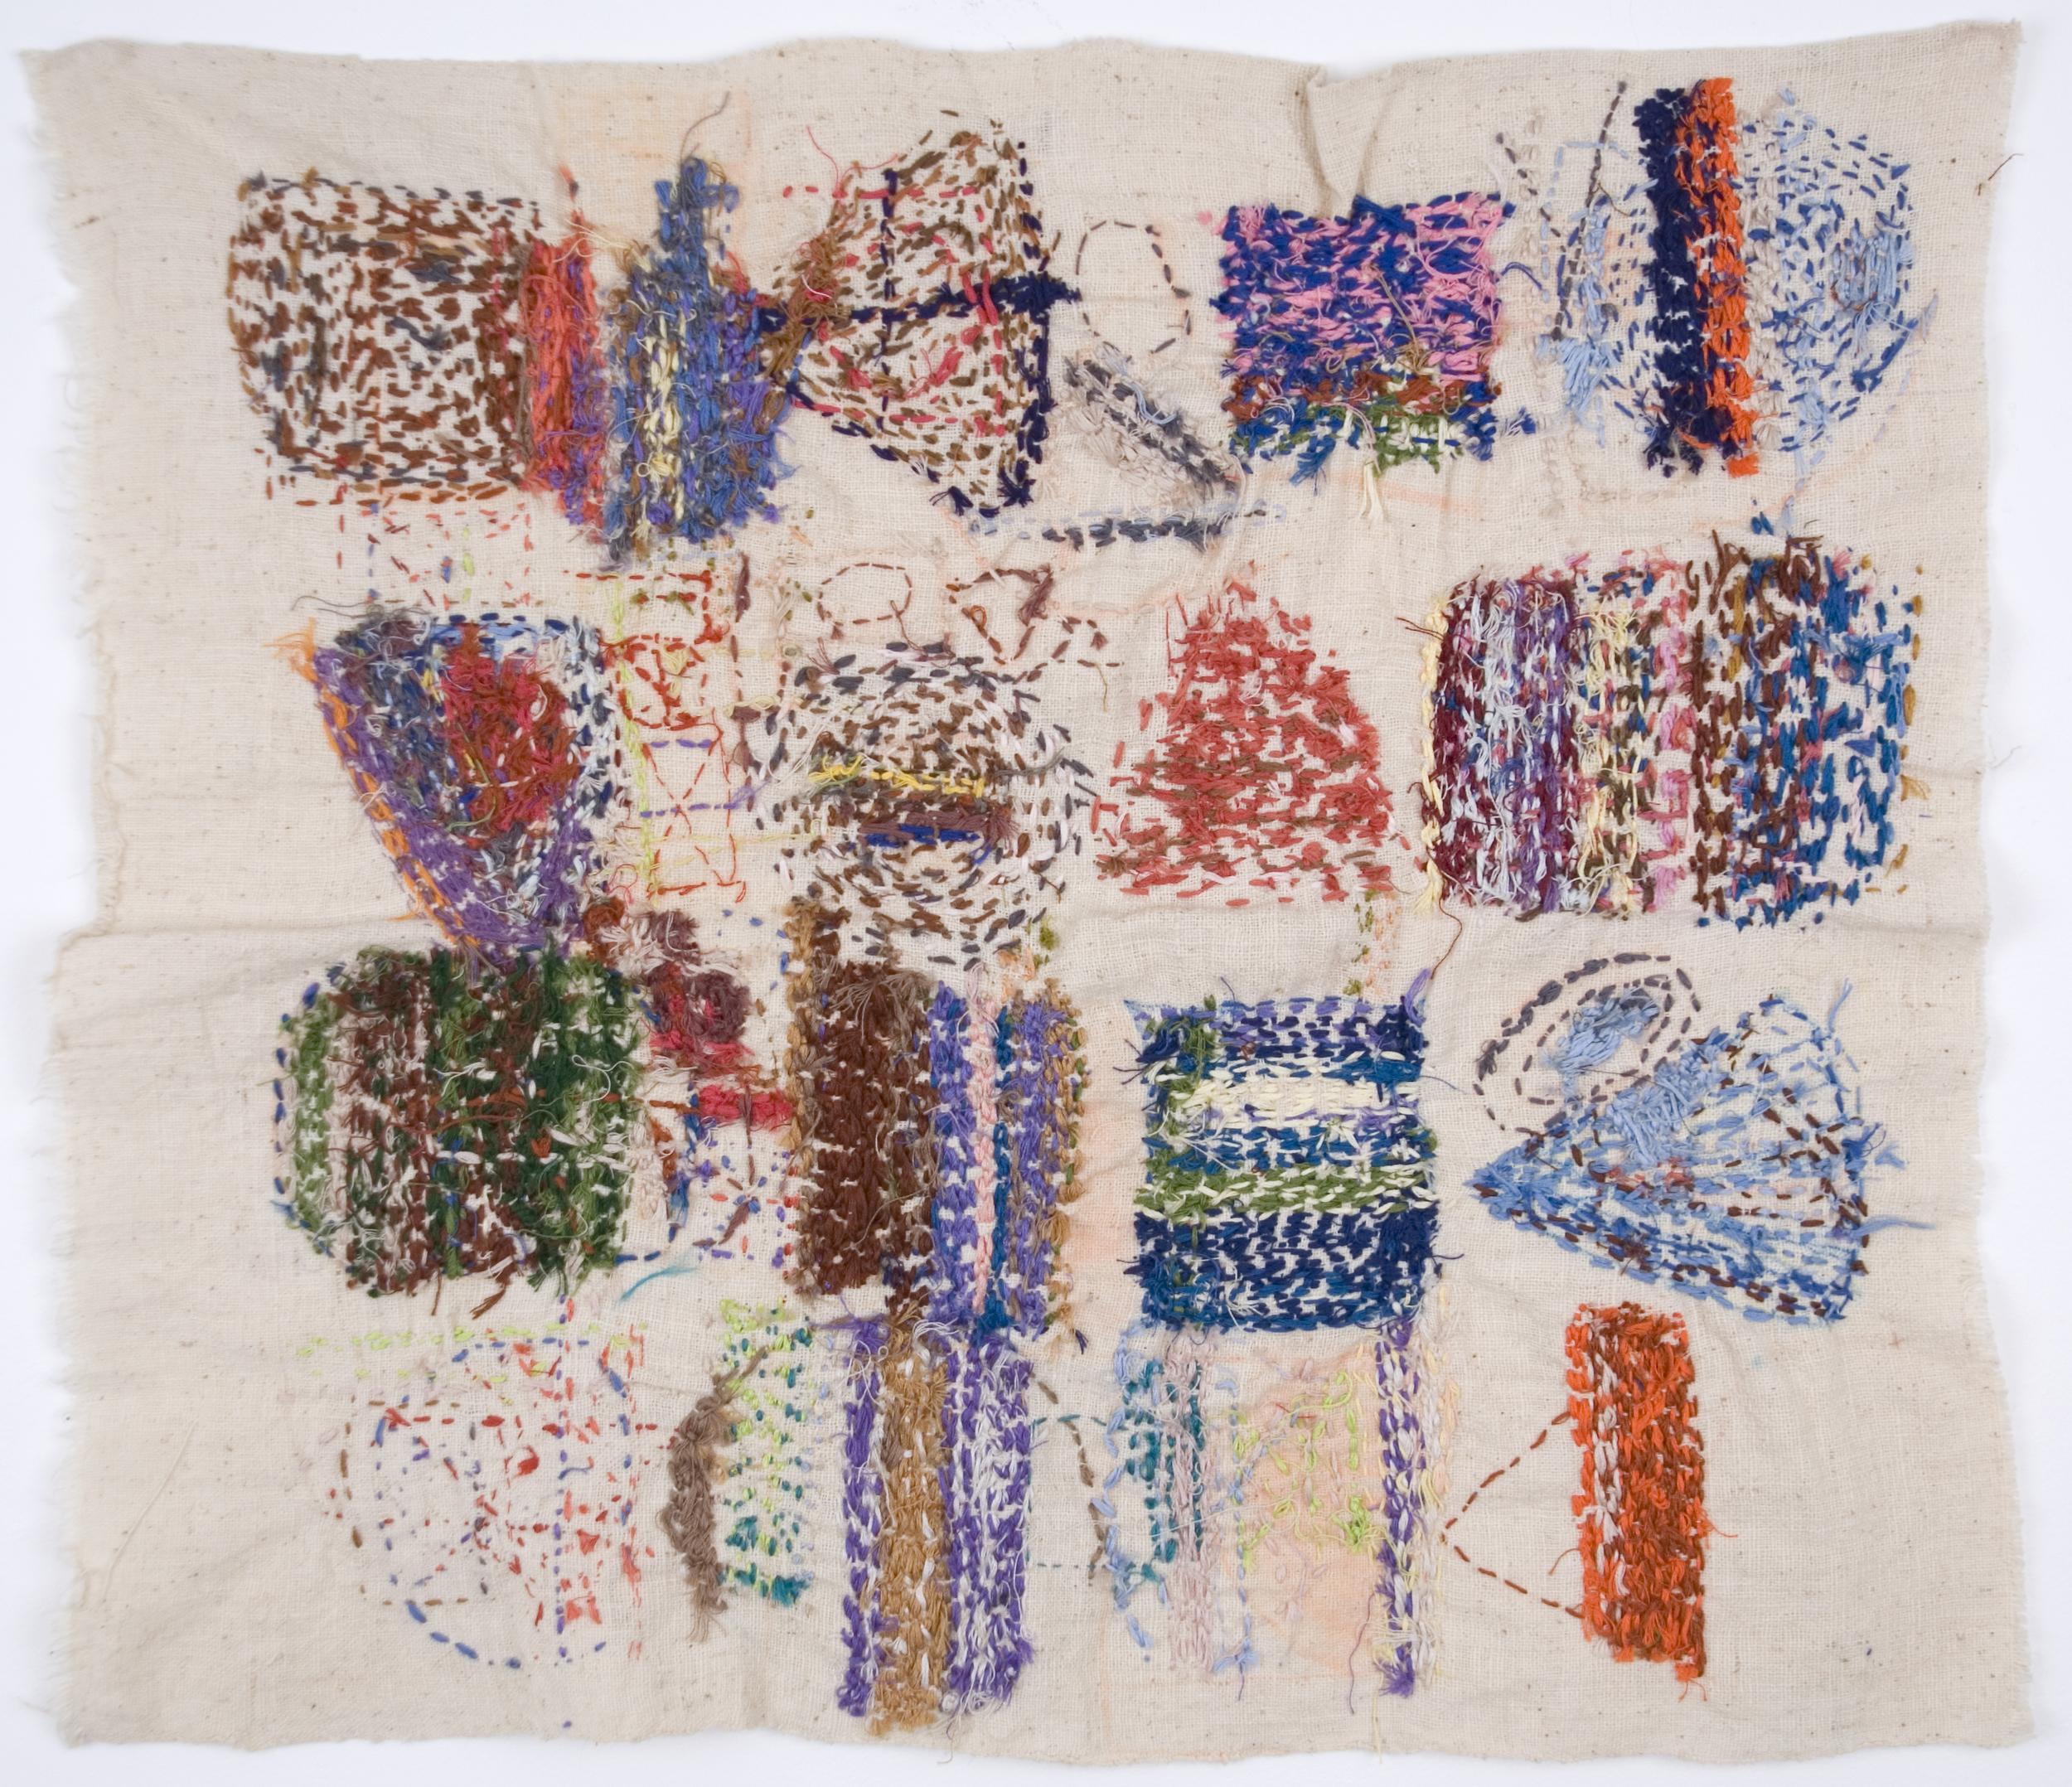 Satoshi Morita    Untitled  , 1997 Cotton, Cotton thread 23 x 21 inches / 58.4 x 53.3 cm / SMo 1